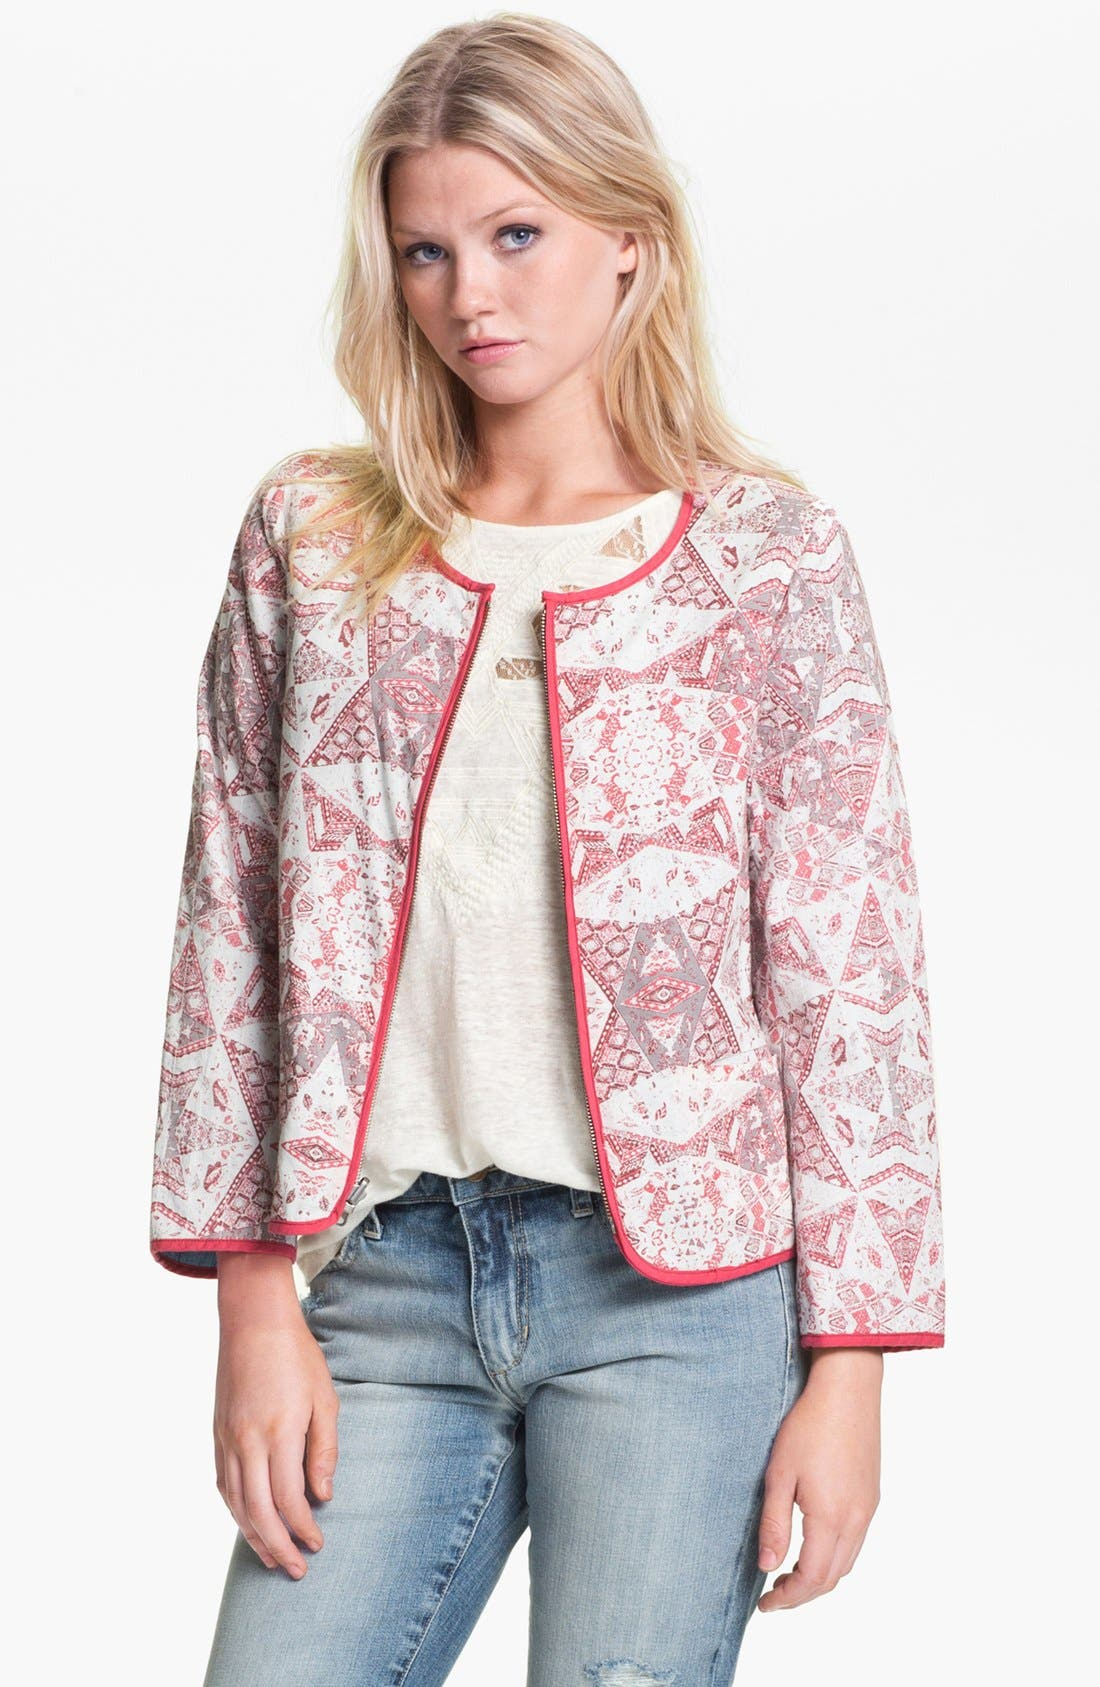 Alternate Image 1 Selected - Sanctuary Quilt Print Jacket